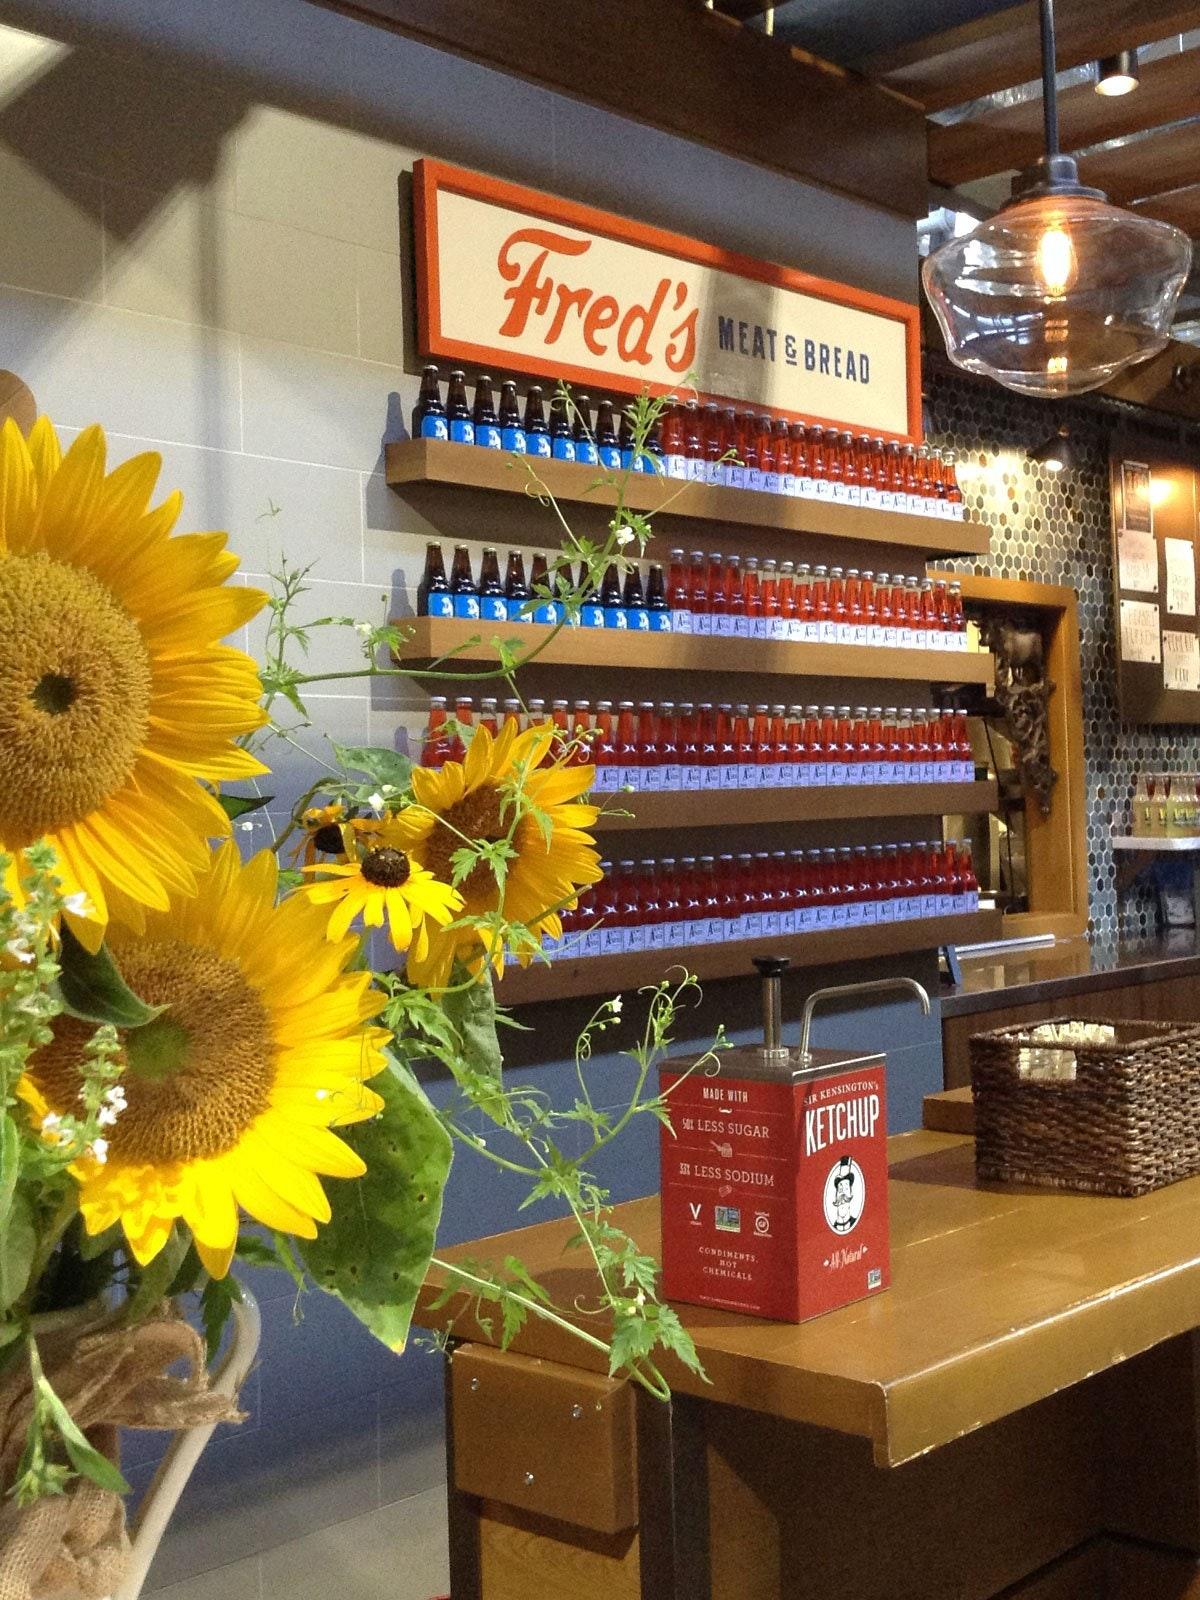 Fred's Meat & Bread